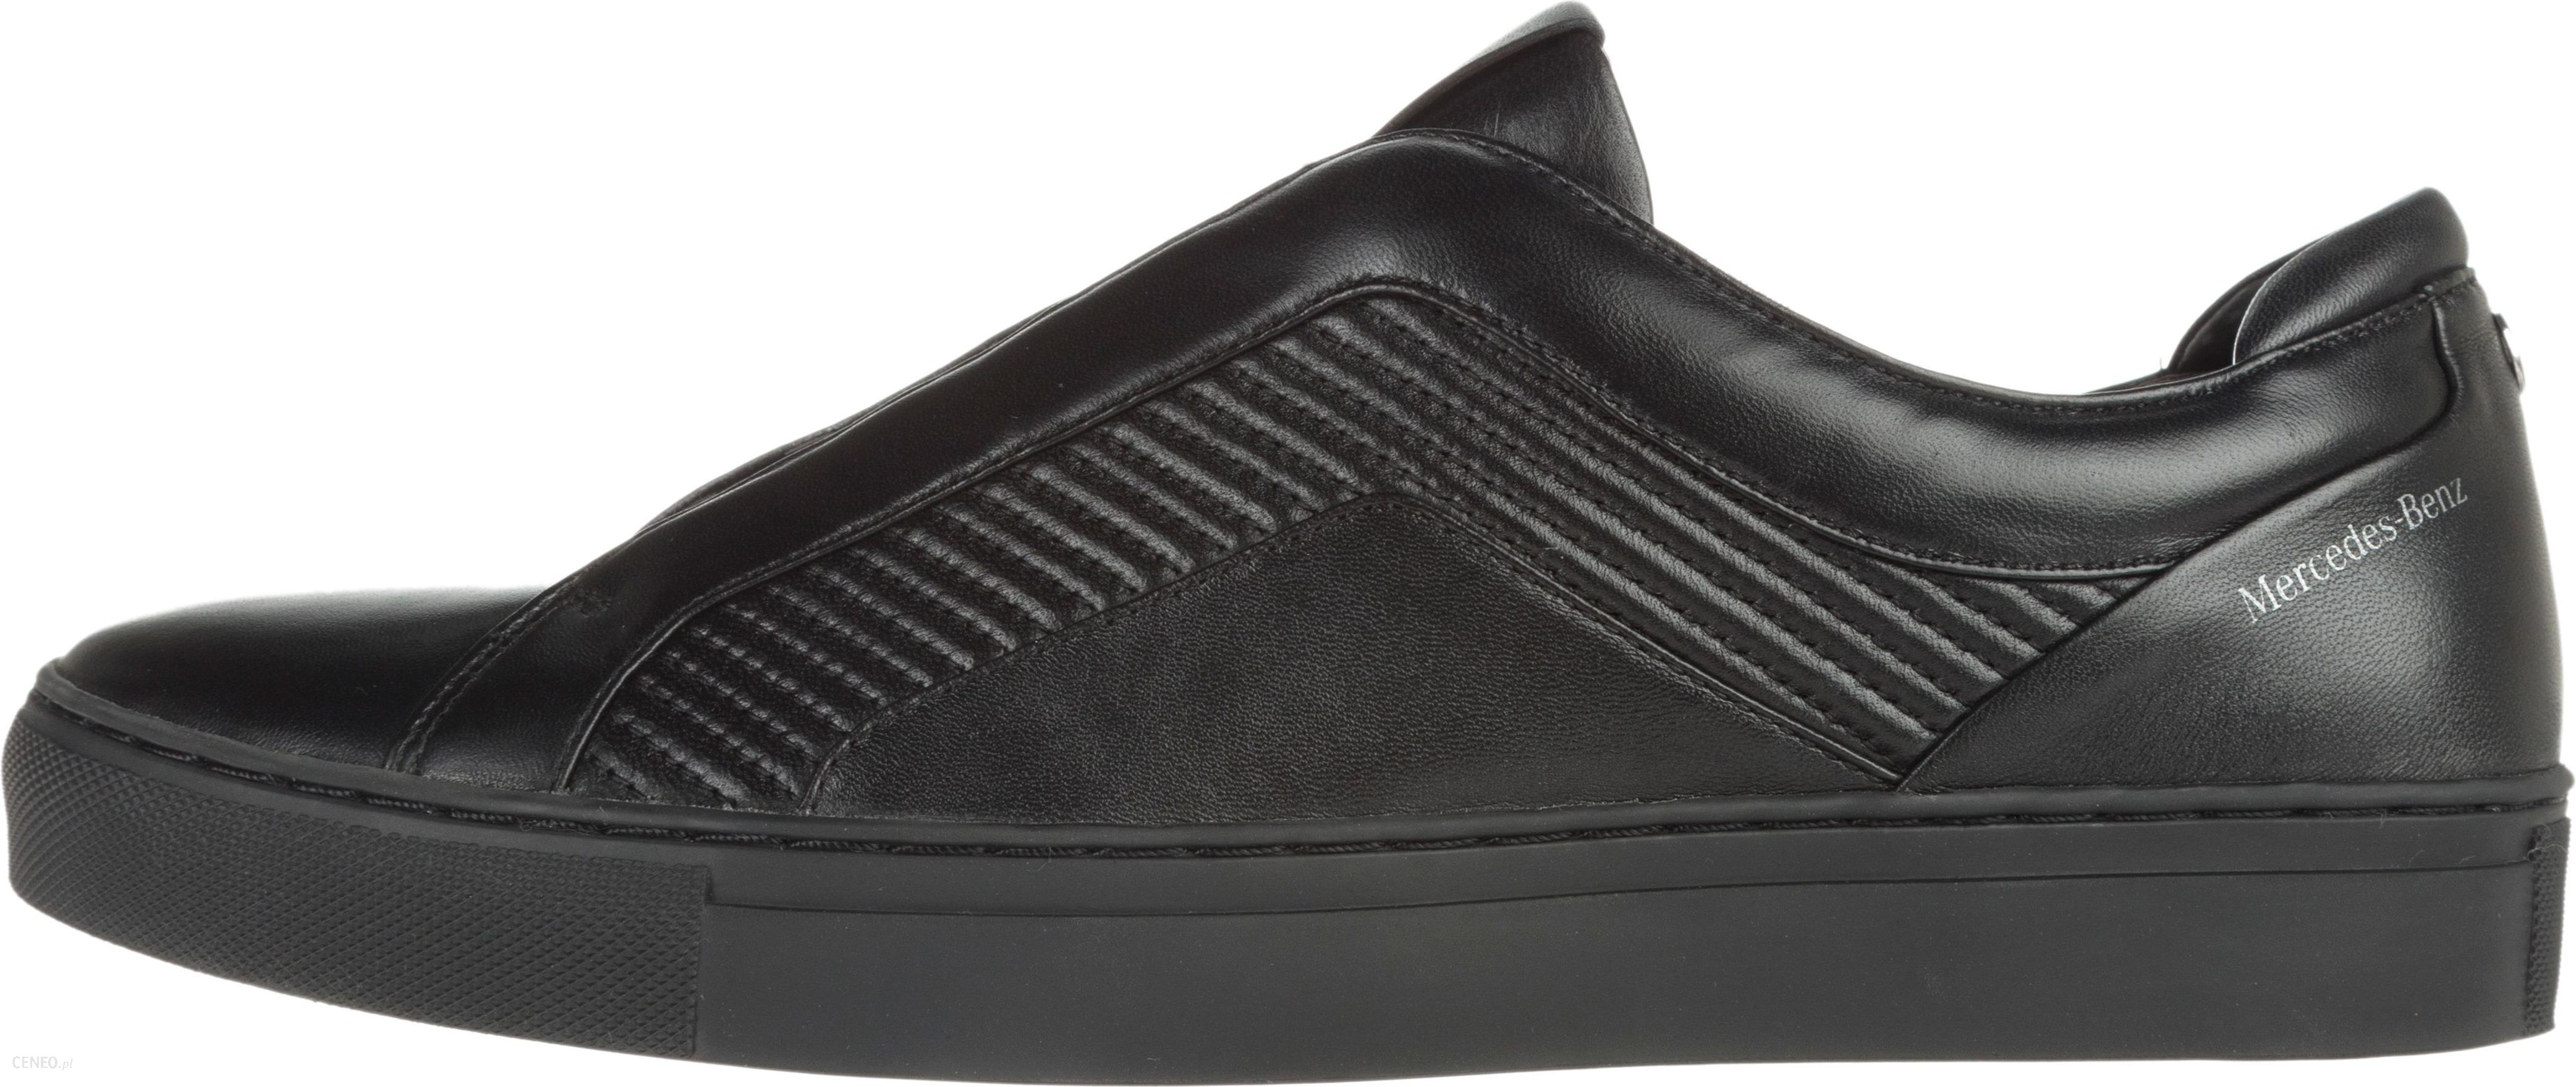 1c77551fcf9be Hugo Boss Timeless Sneakers Czarny 44 - Ceny i opinie - Ceneo.pl